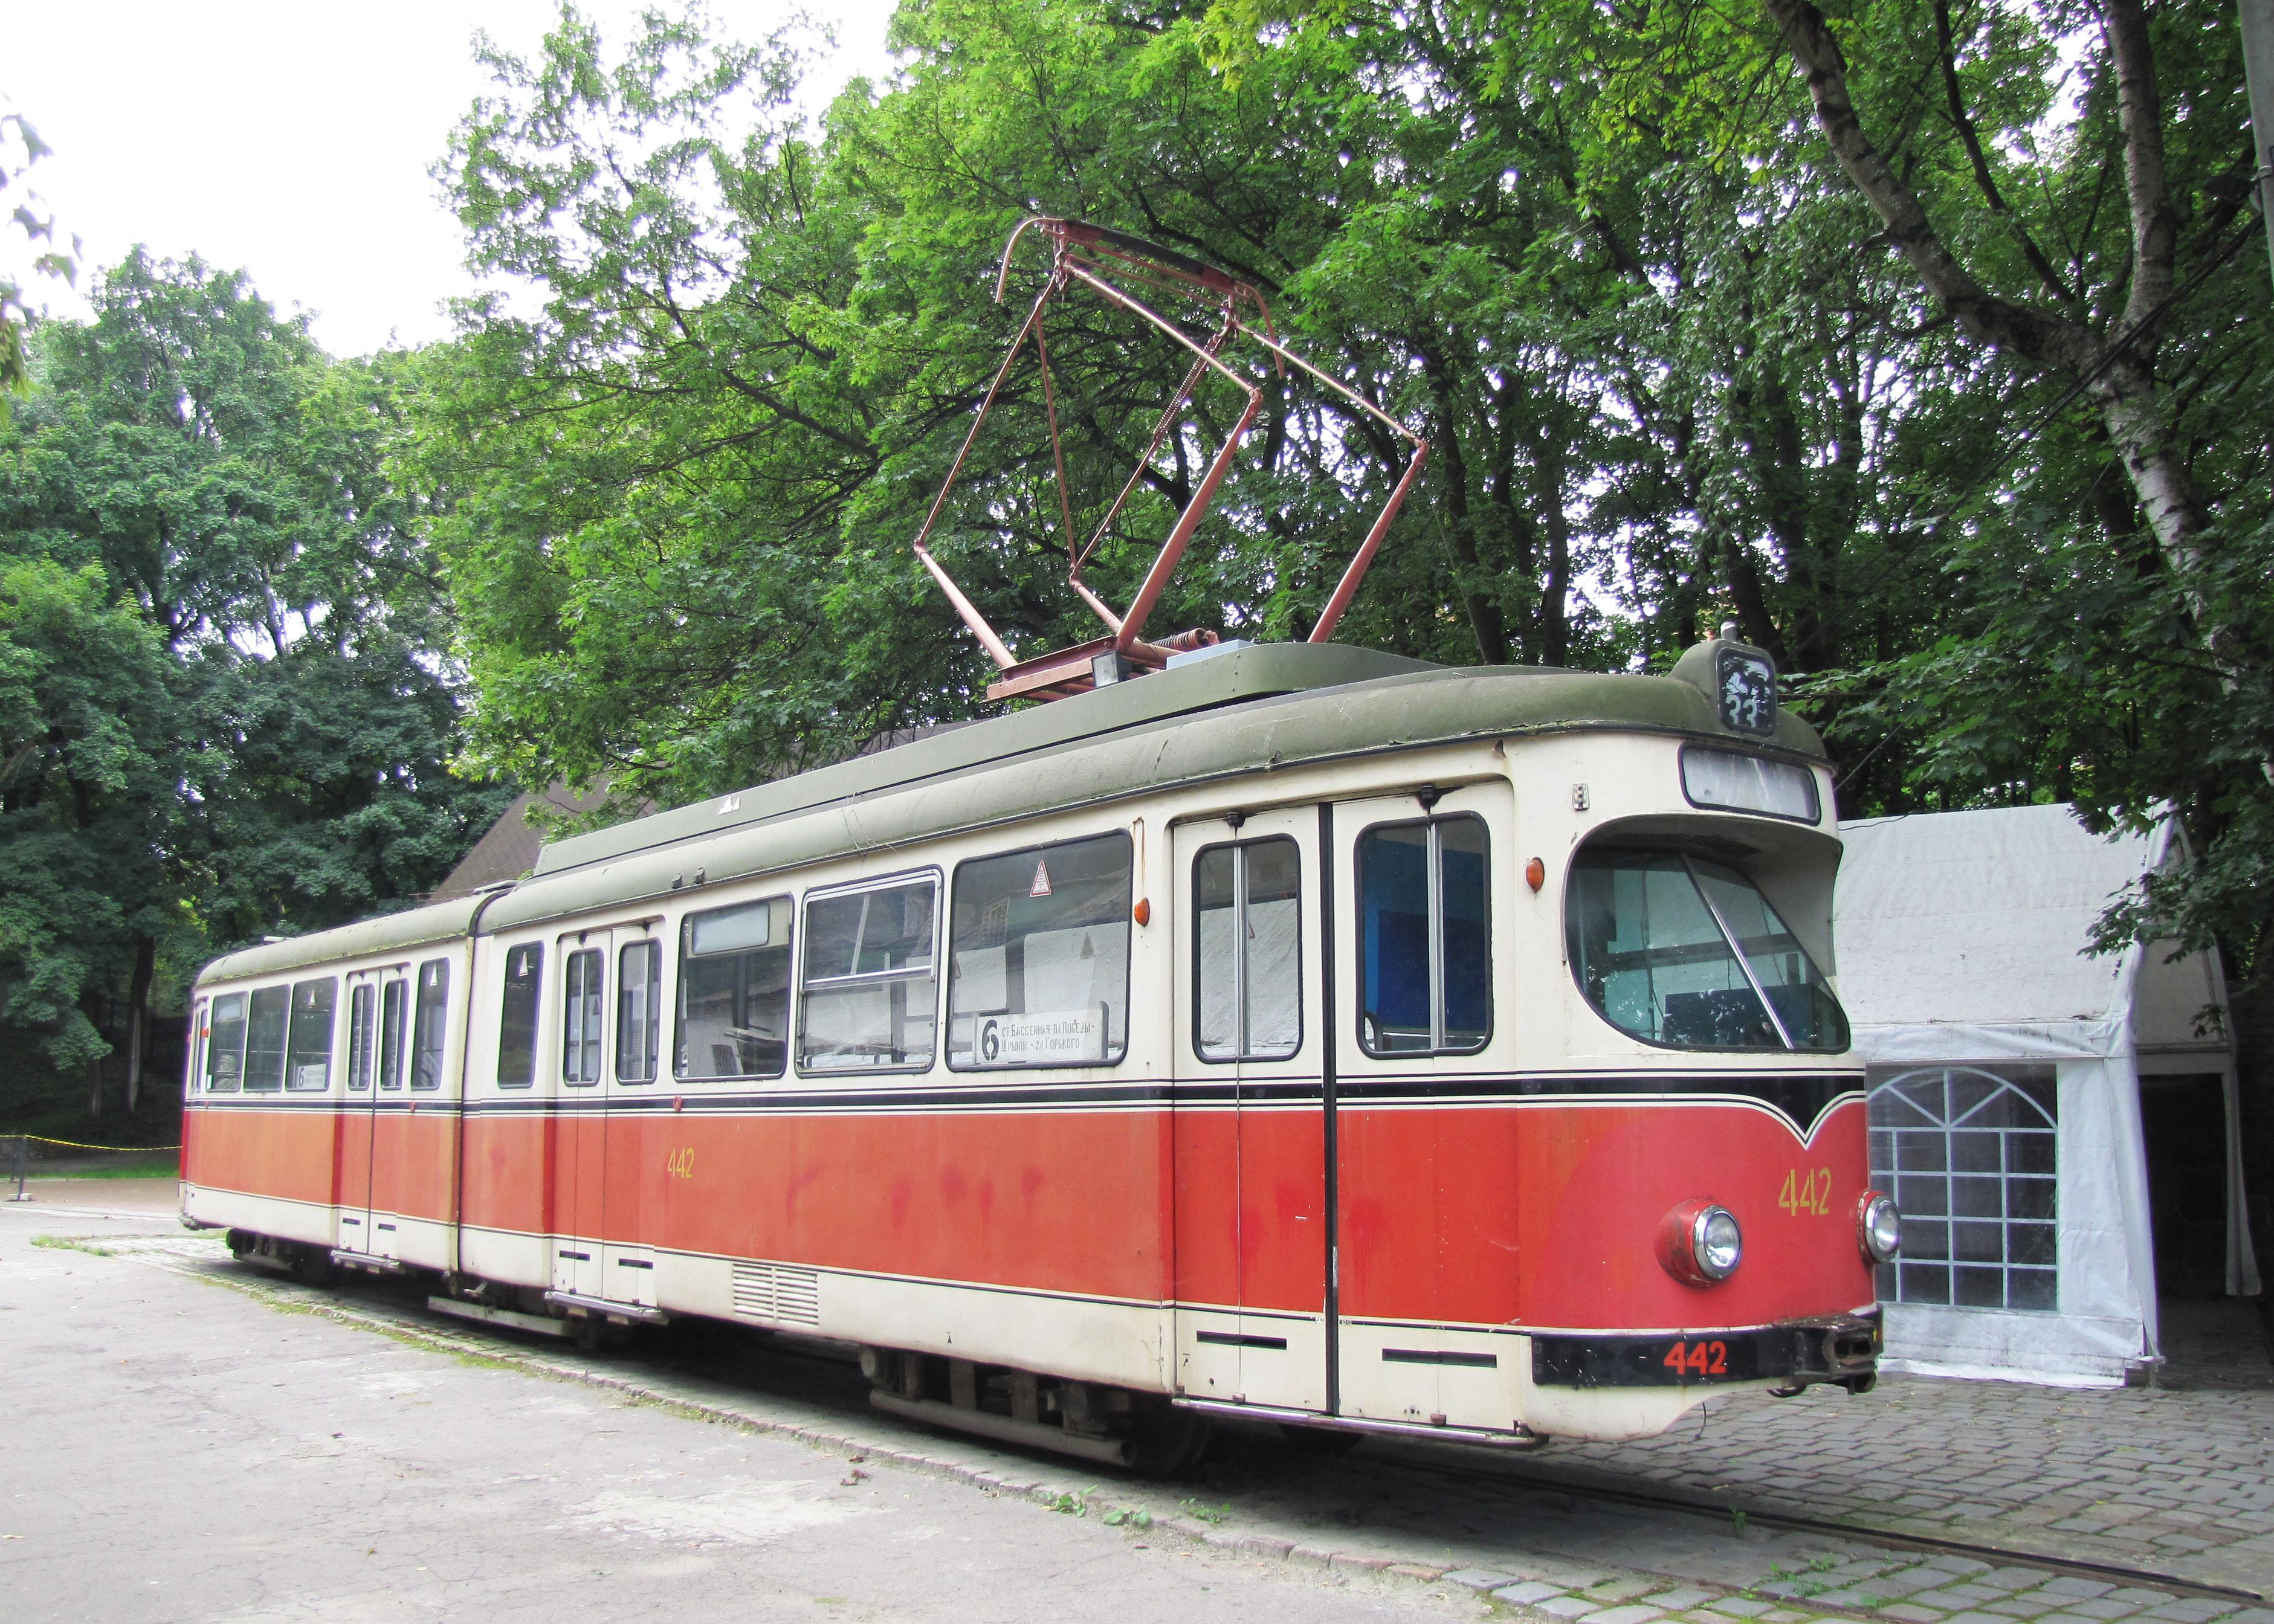 Tram in Kaliningrad, Russia